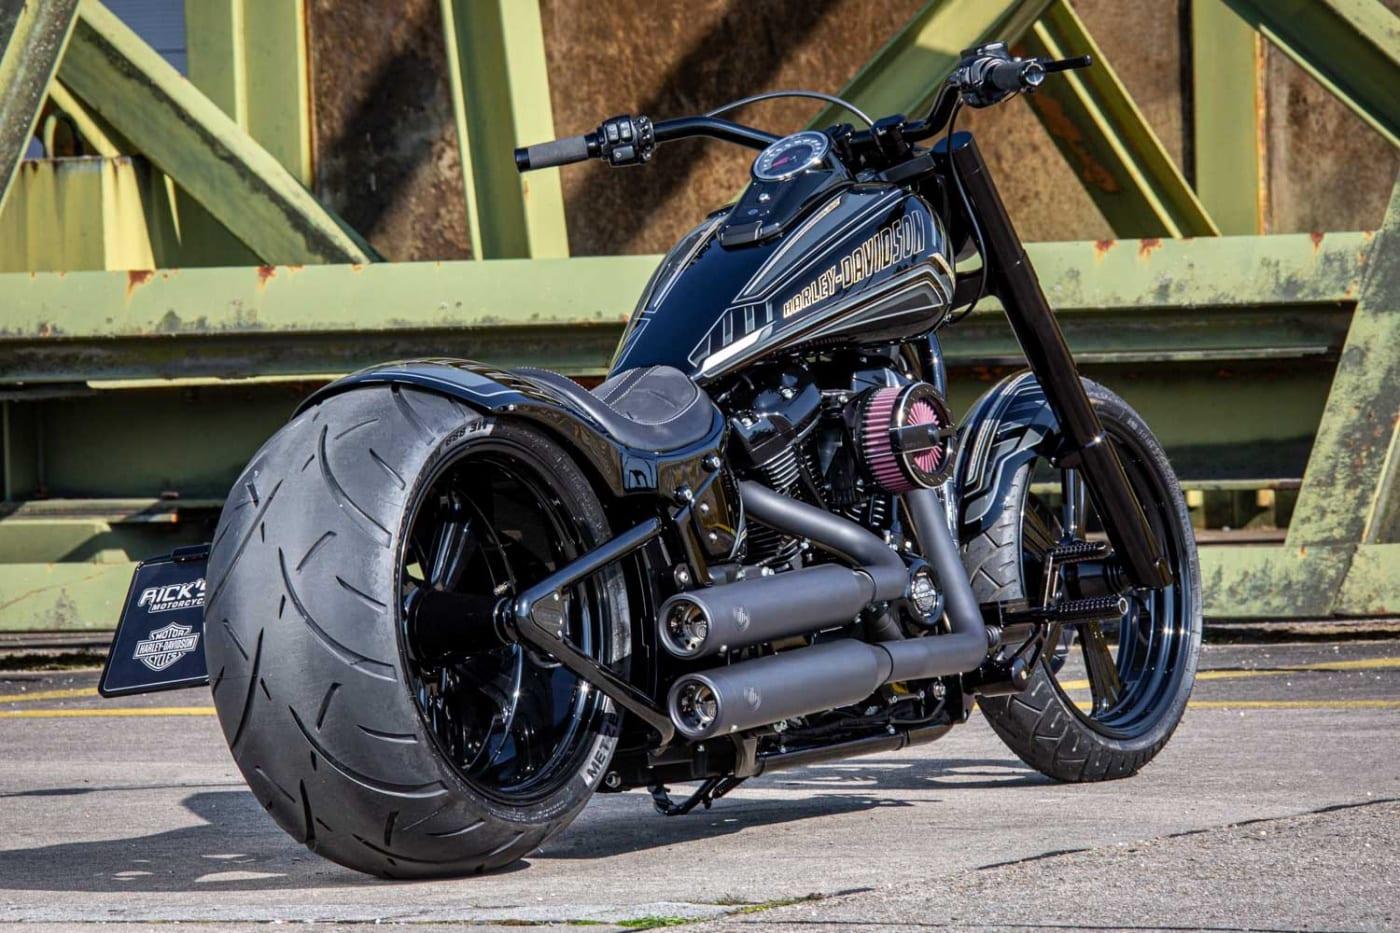 WOTAN - Rick´s Motorcycles Fat Boy 300 mit legaler KessTech Auspuffanlage